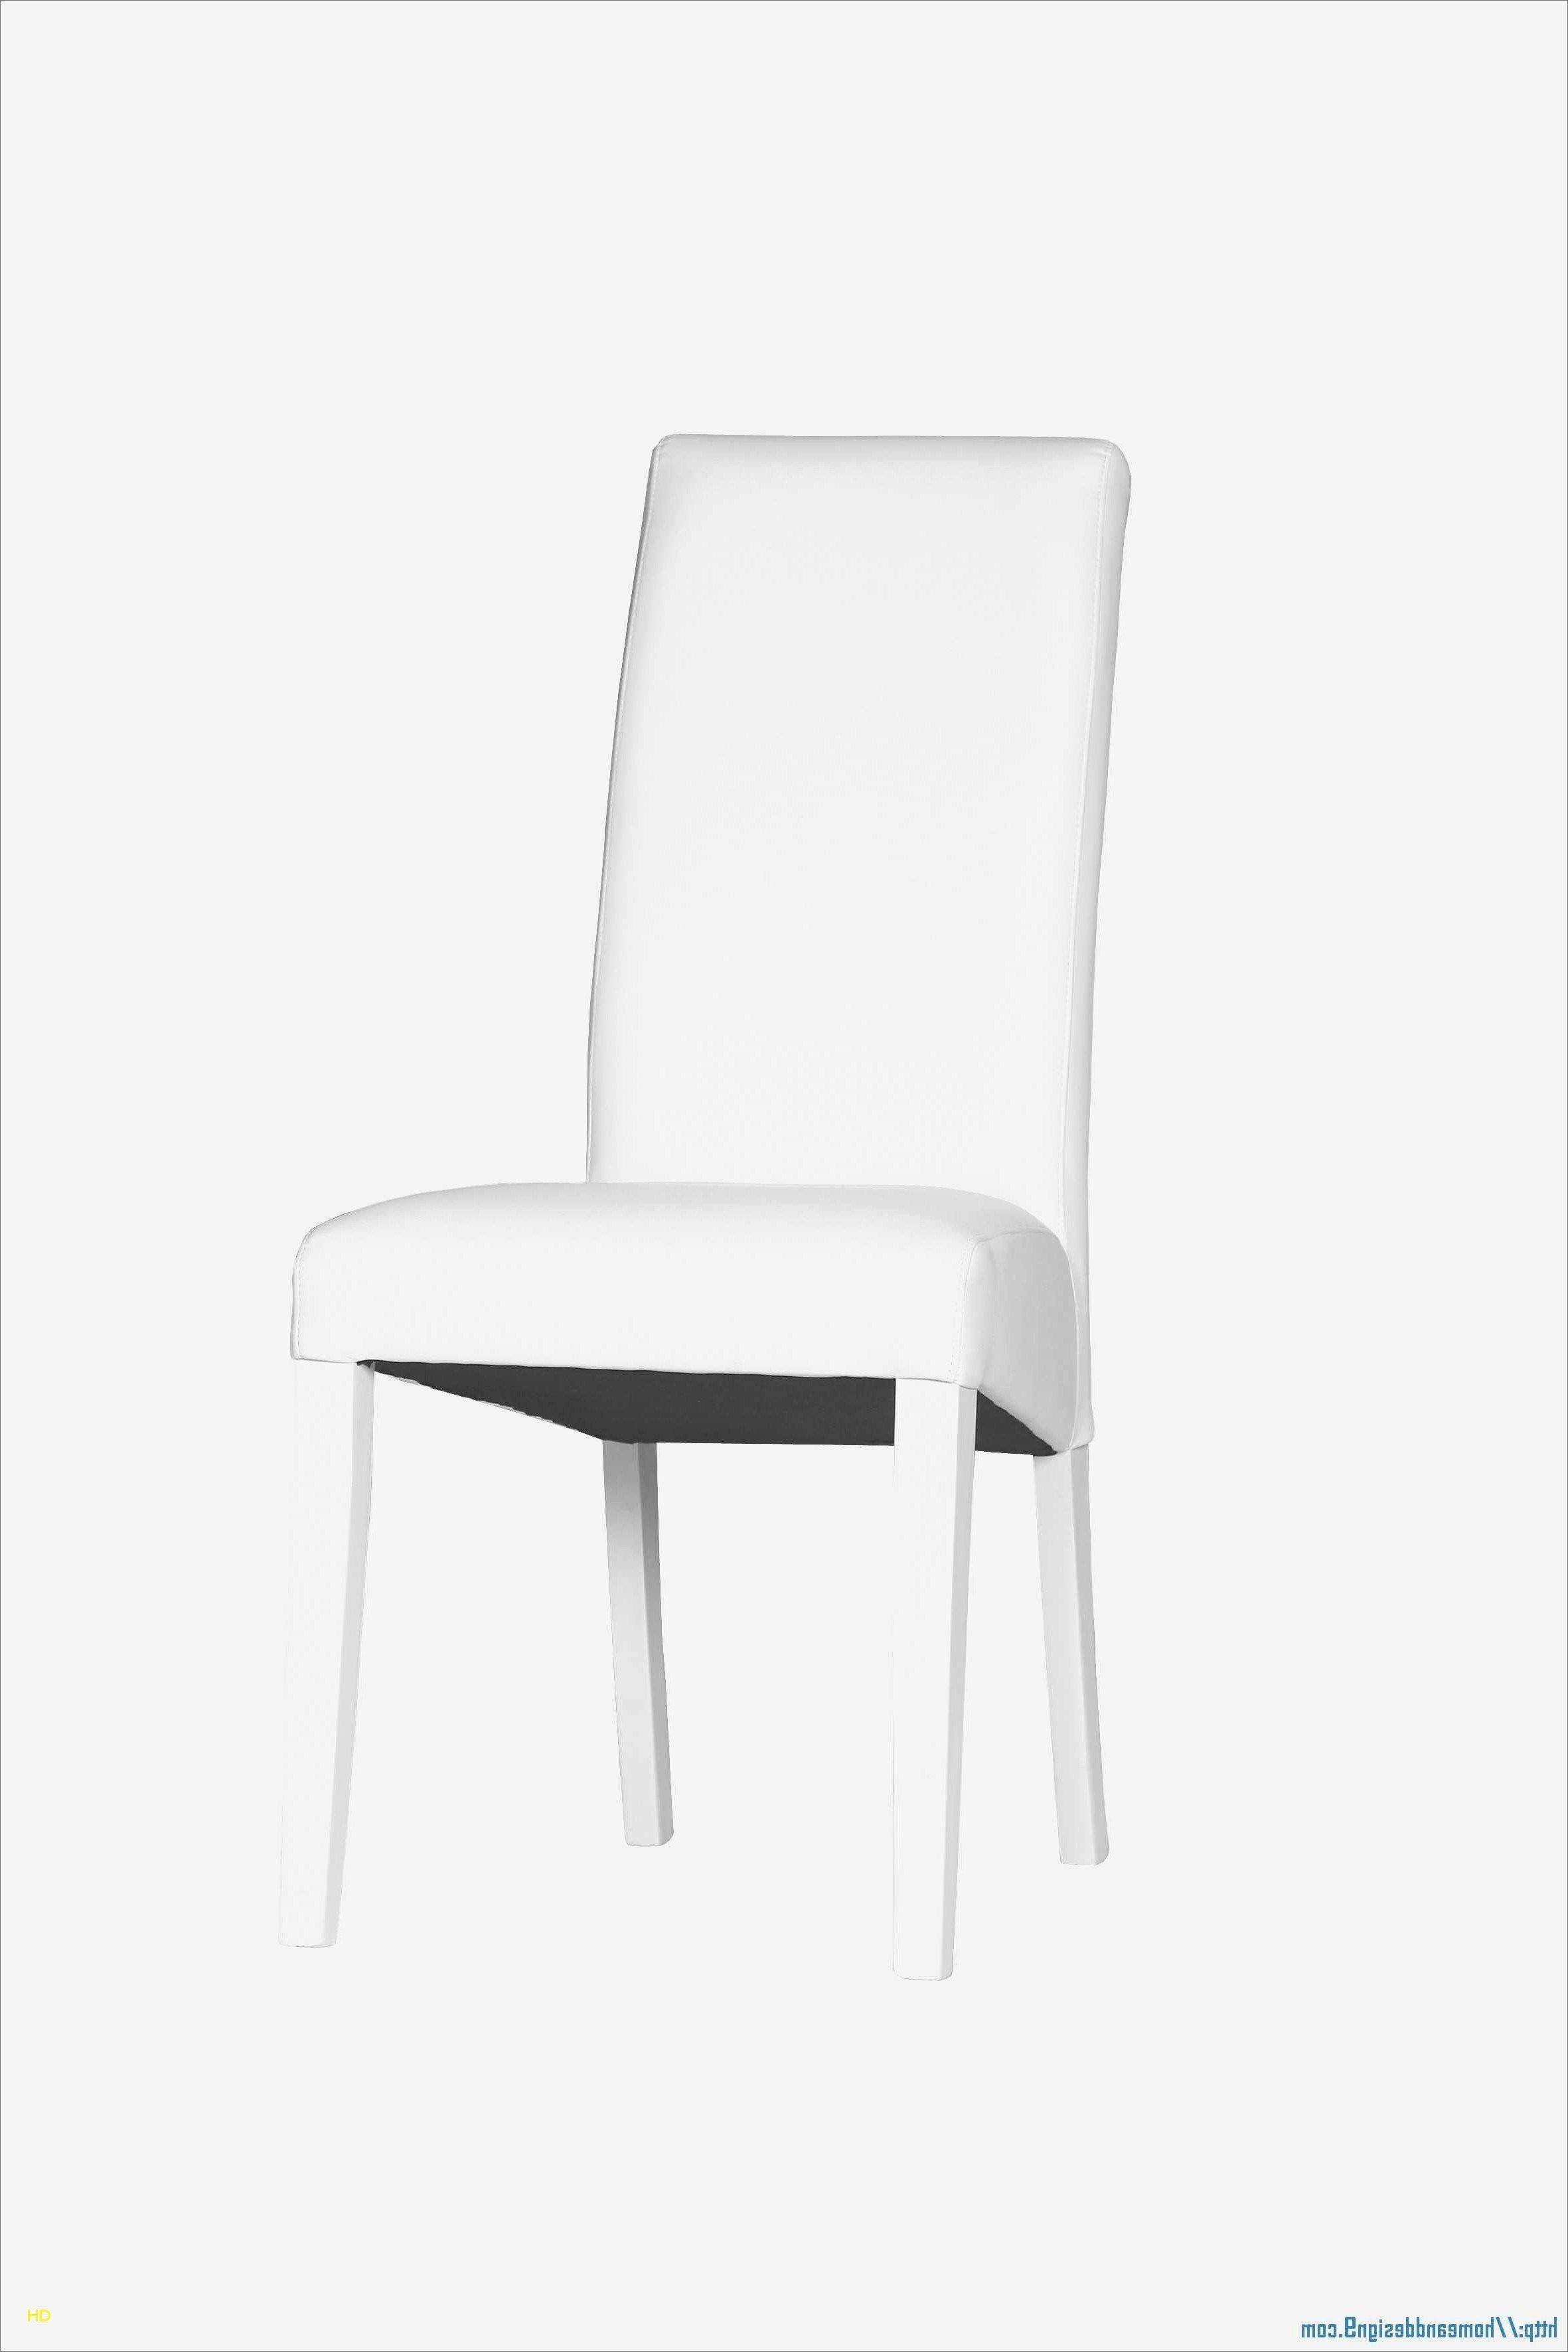 Chaise Cuisine Ikea Fra che Galette Chaise Ikea Best Chaise Bistrot Ikea Beau Rangement Ike ...